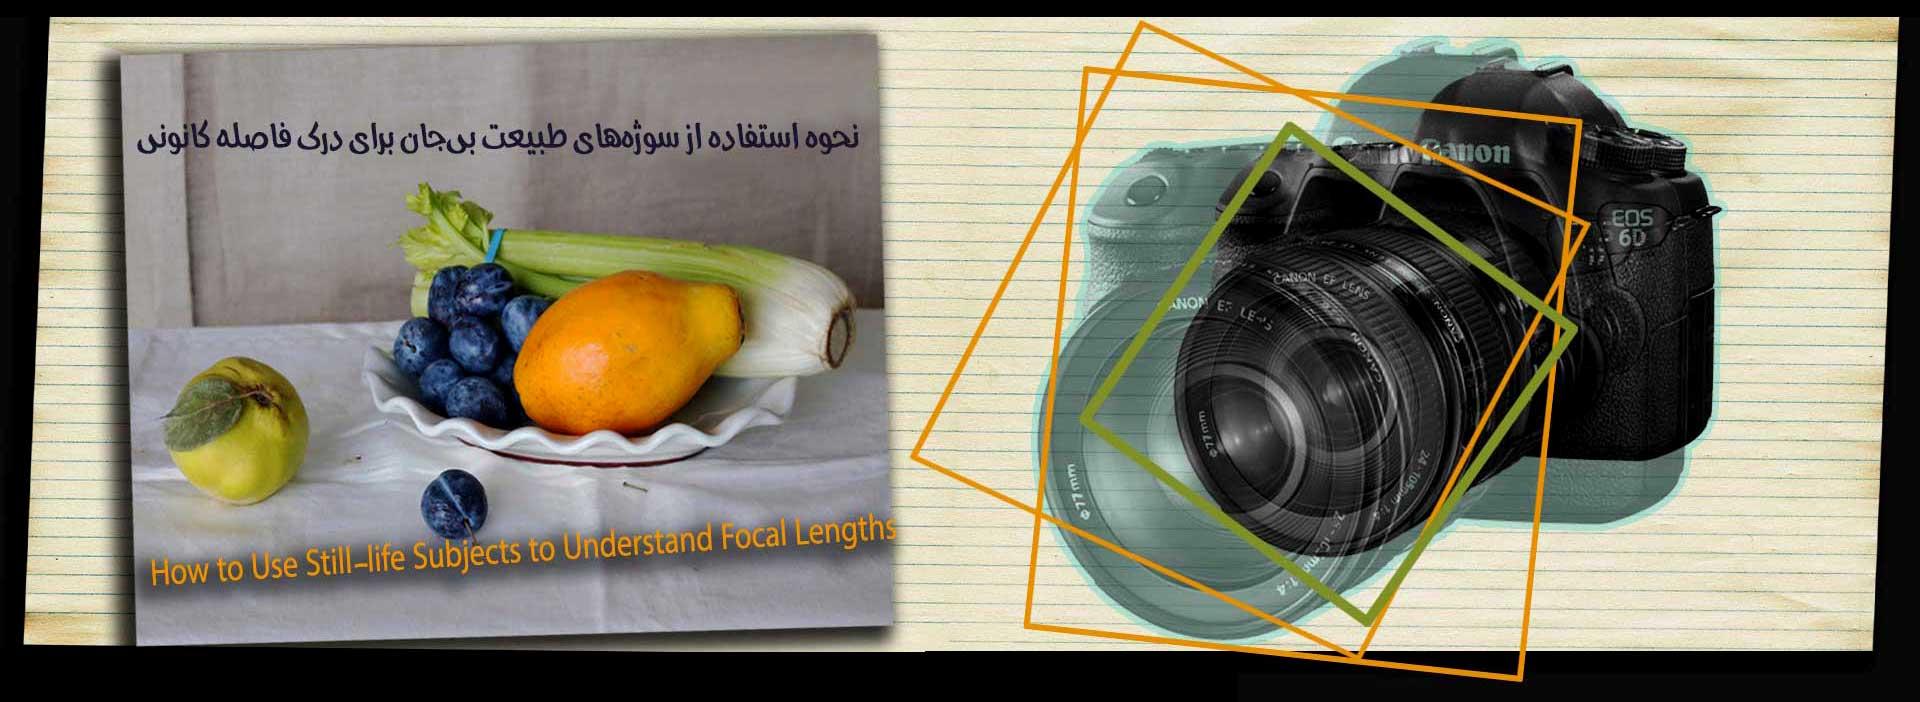 Still life Subjects  Understand Focal  Lengths 2 2 - نحوه استفاده از سوژههای طبیعت بیجان برای درک فاصله کانونی